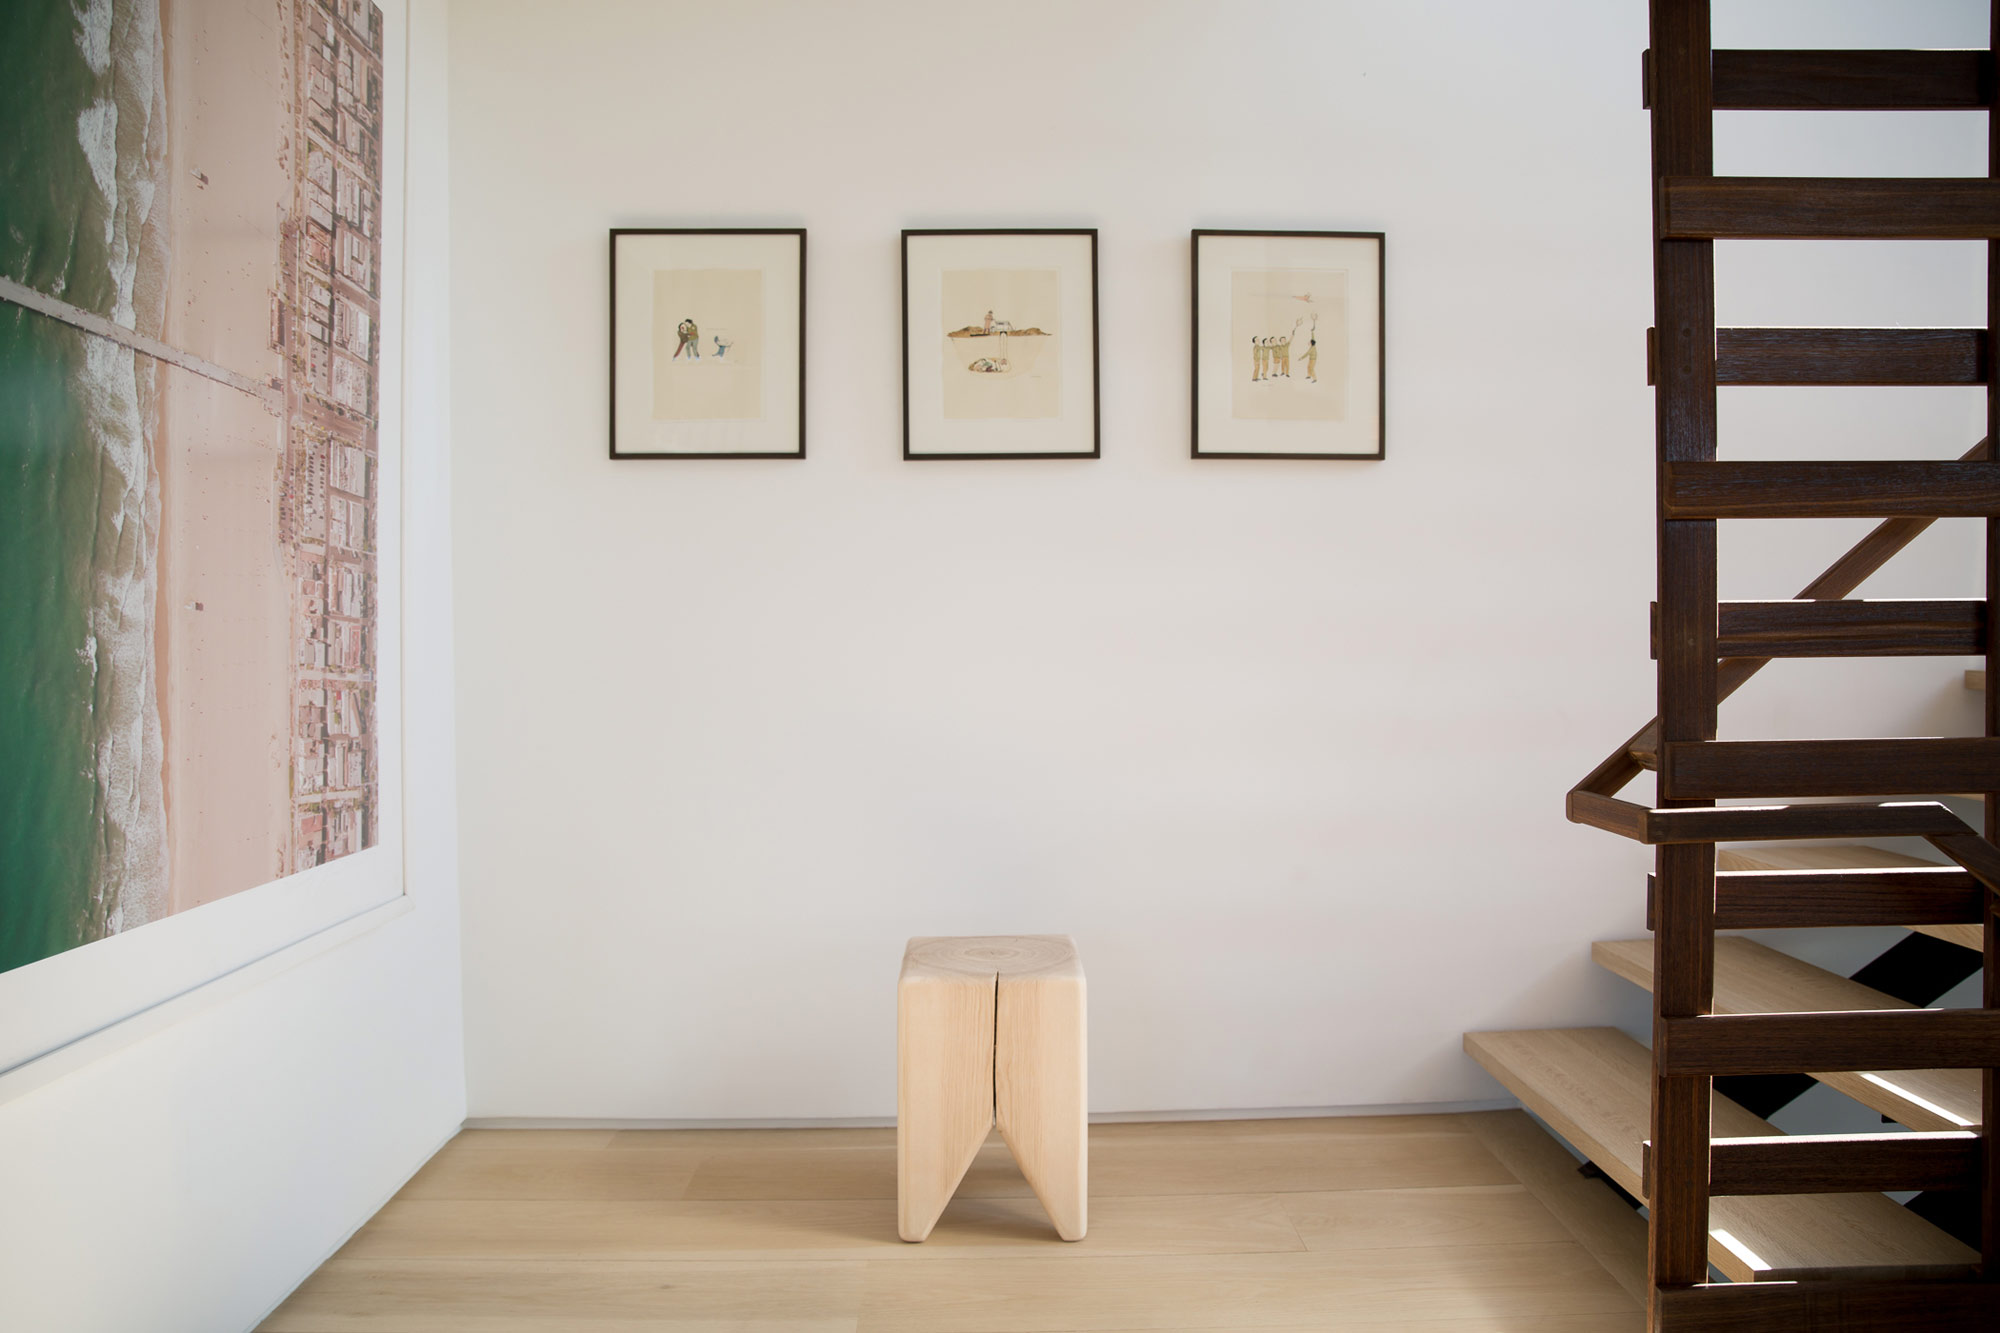 Stump stool in modern house